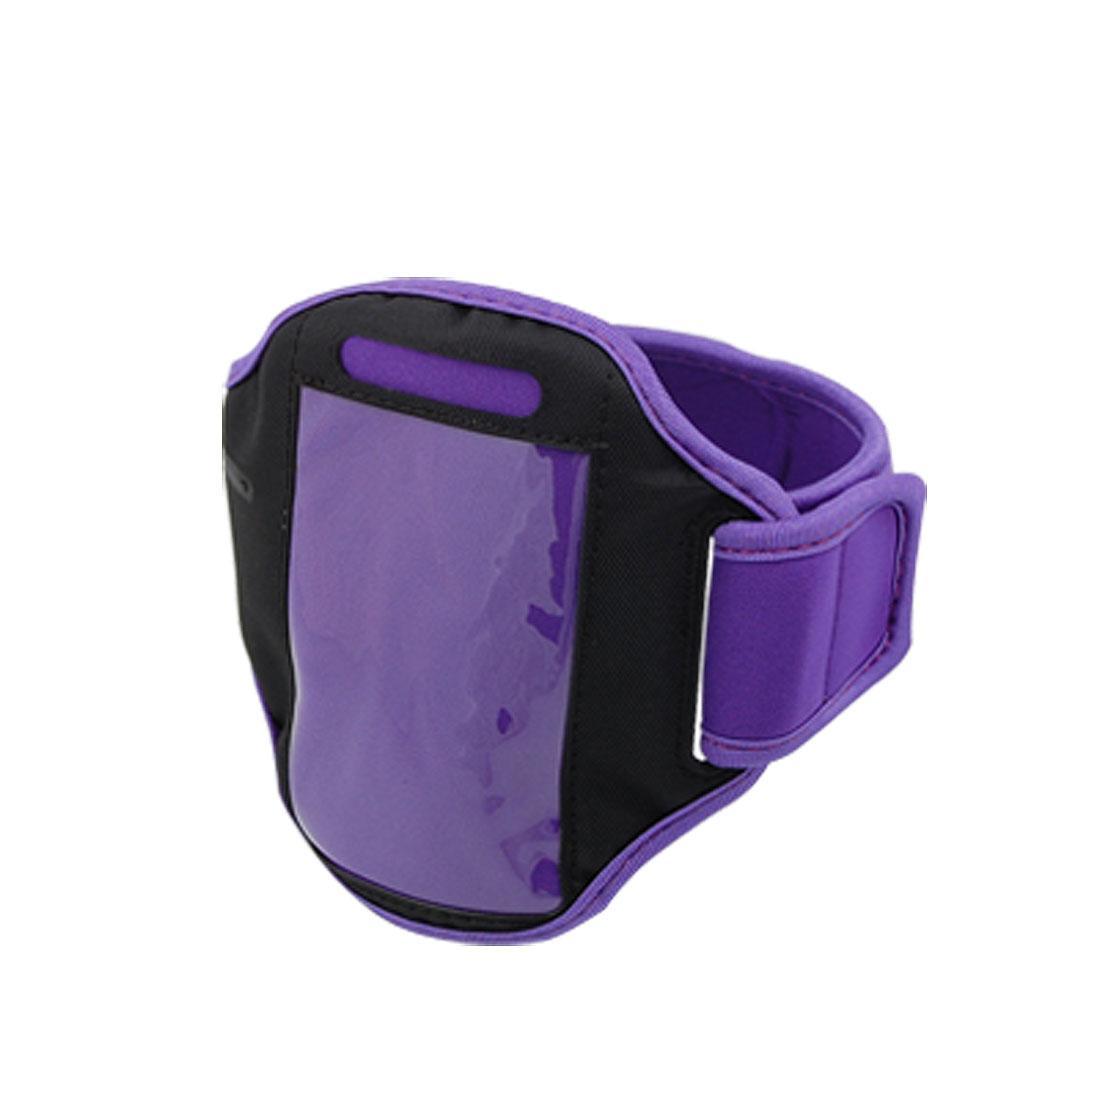 Purple Black Hook and Loop Fastener Closure Neoprene Armband for Cell Phone